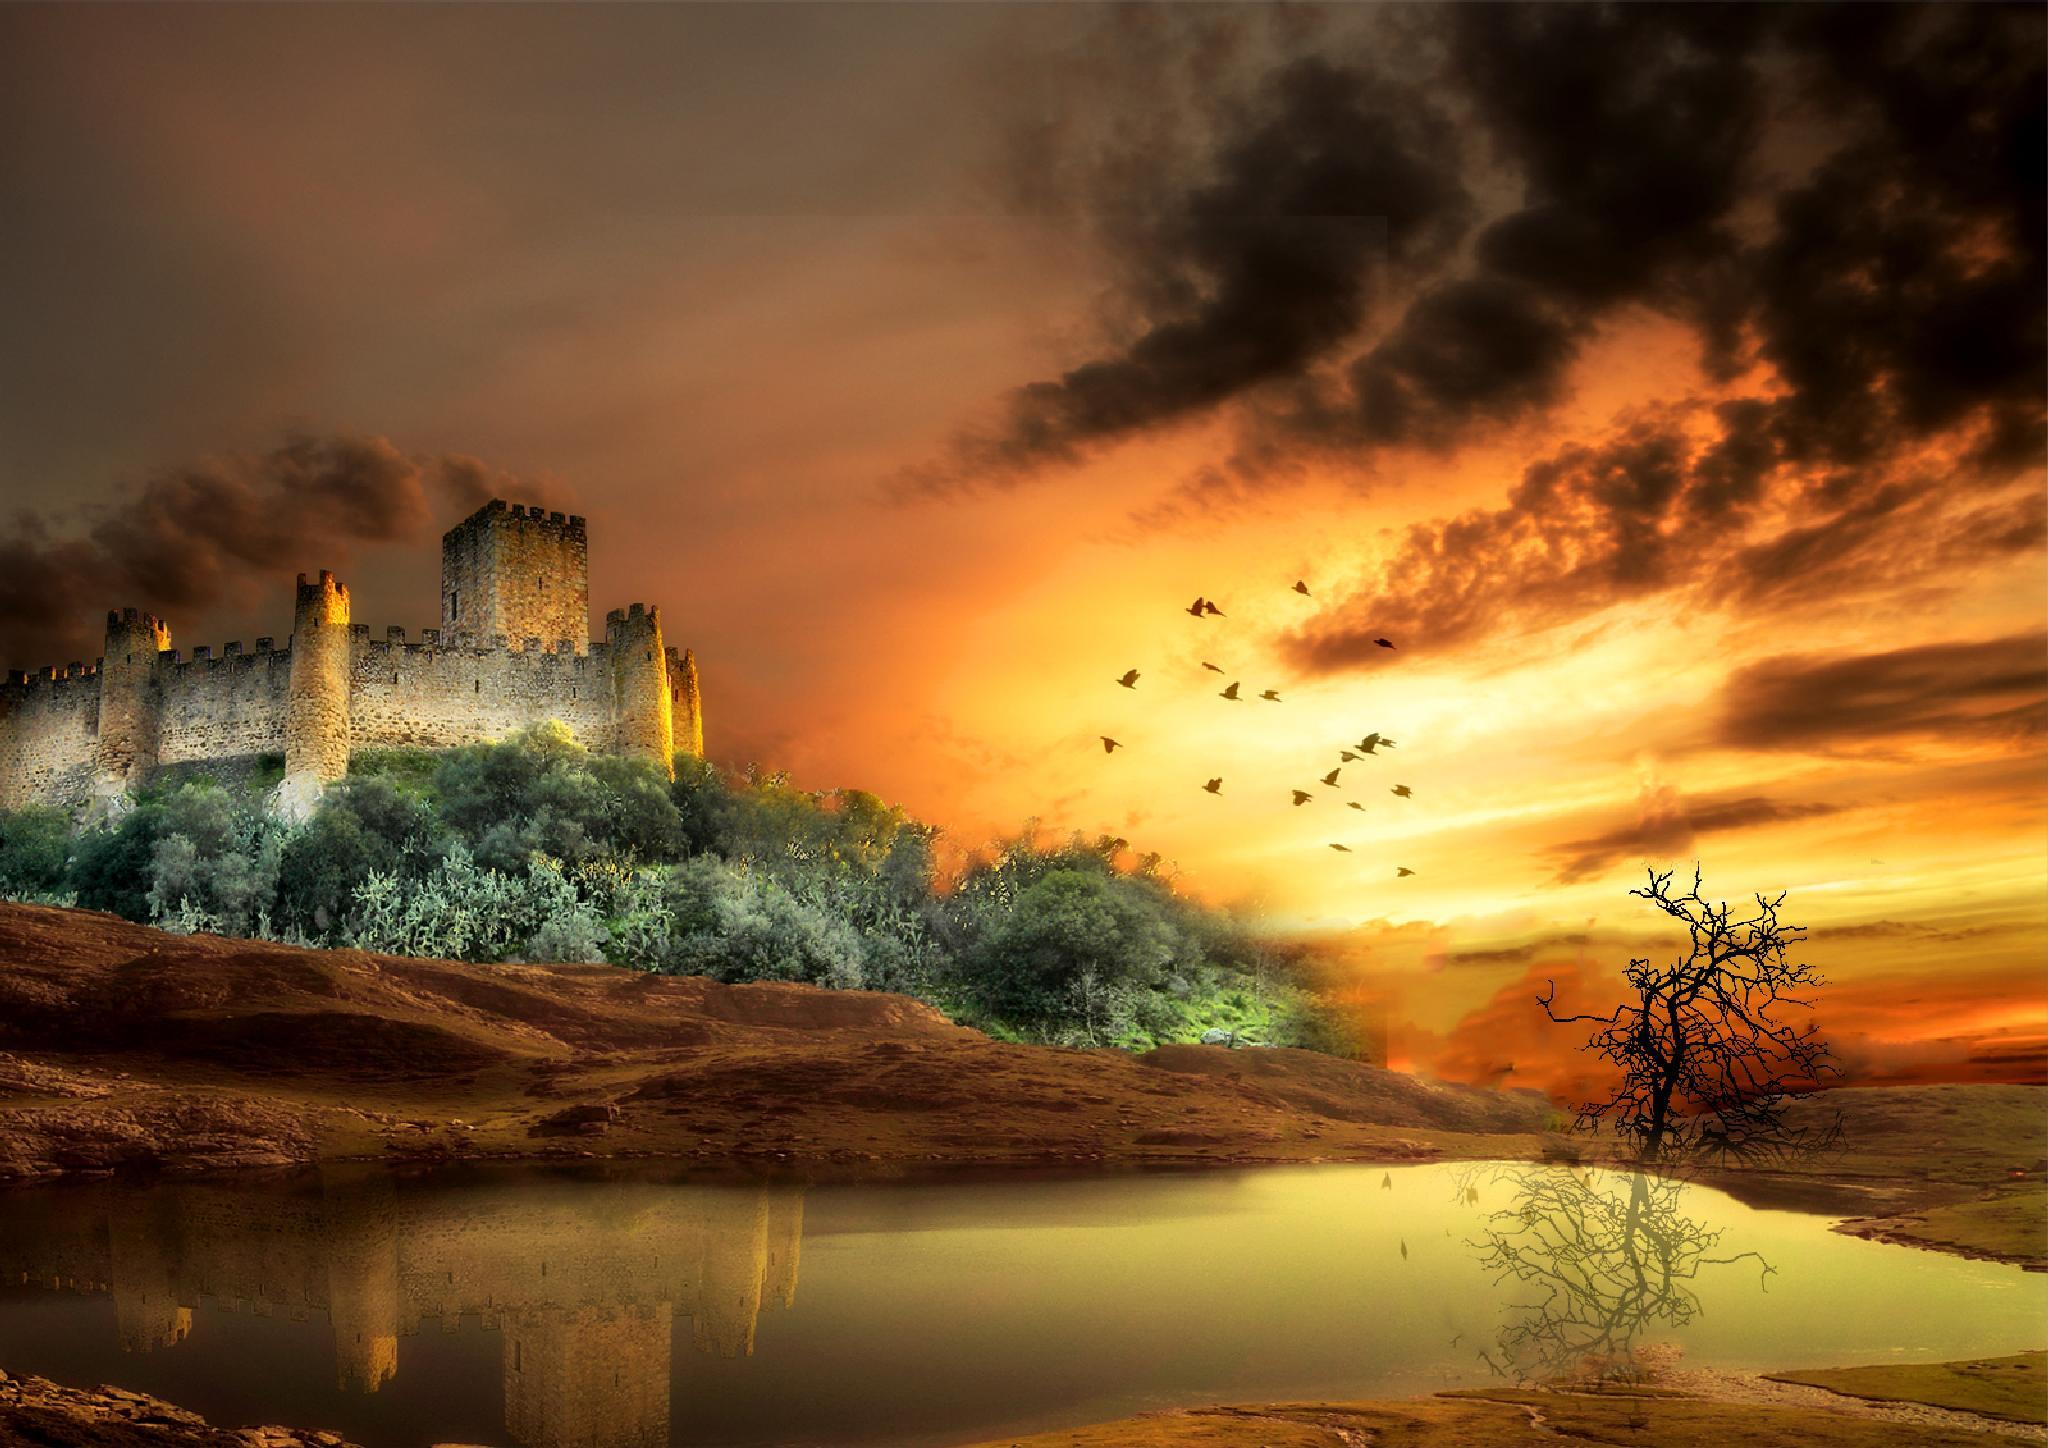 Castillo by toalafoto